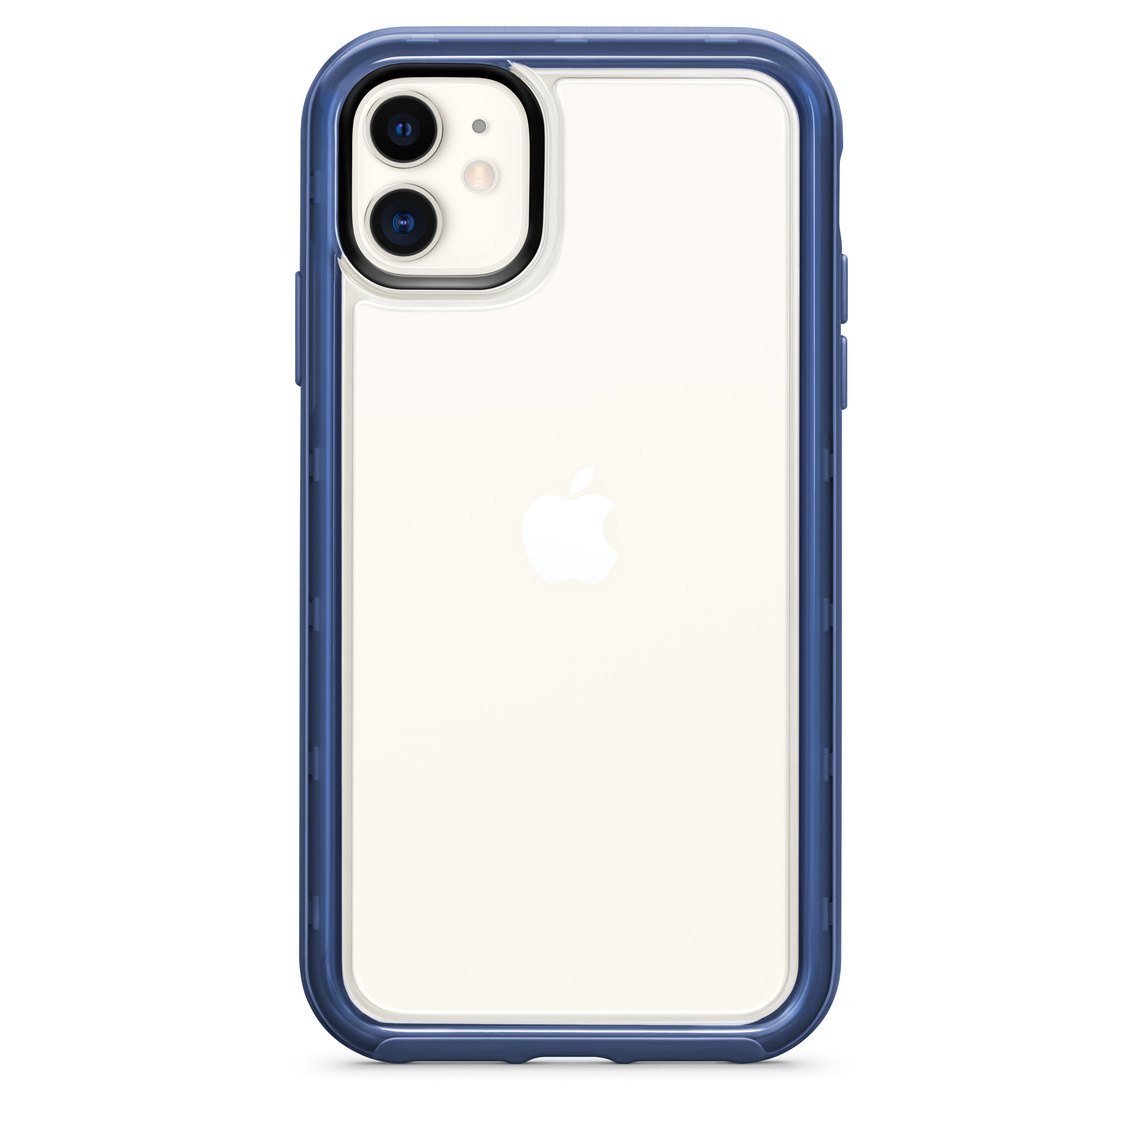 coque otterbox iphone 4